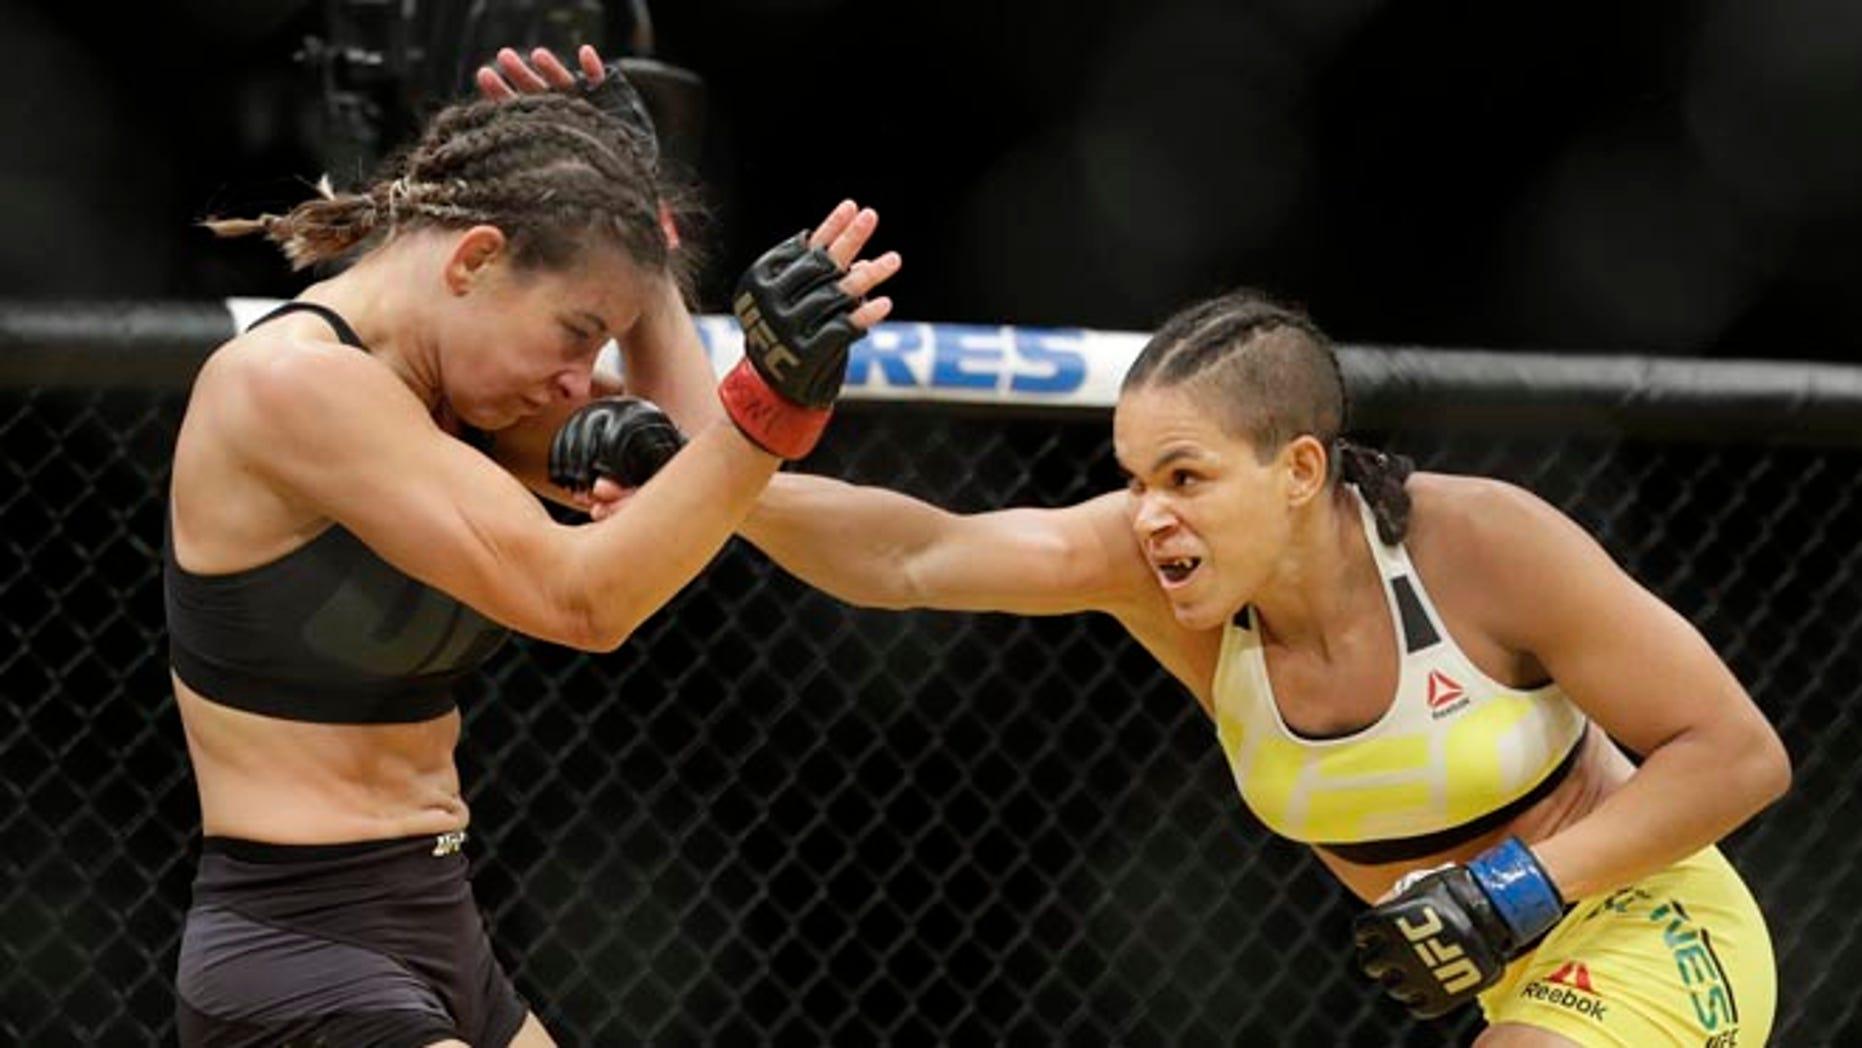 Amanda Nunes, right, hits Miesha Tate during their women's bantamweight championship mixed martial arts bout at UFC 200, Saturday, July 9, 2016, in Las Vegas. (AP Photo/John Locher)